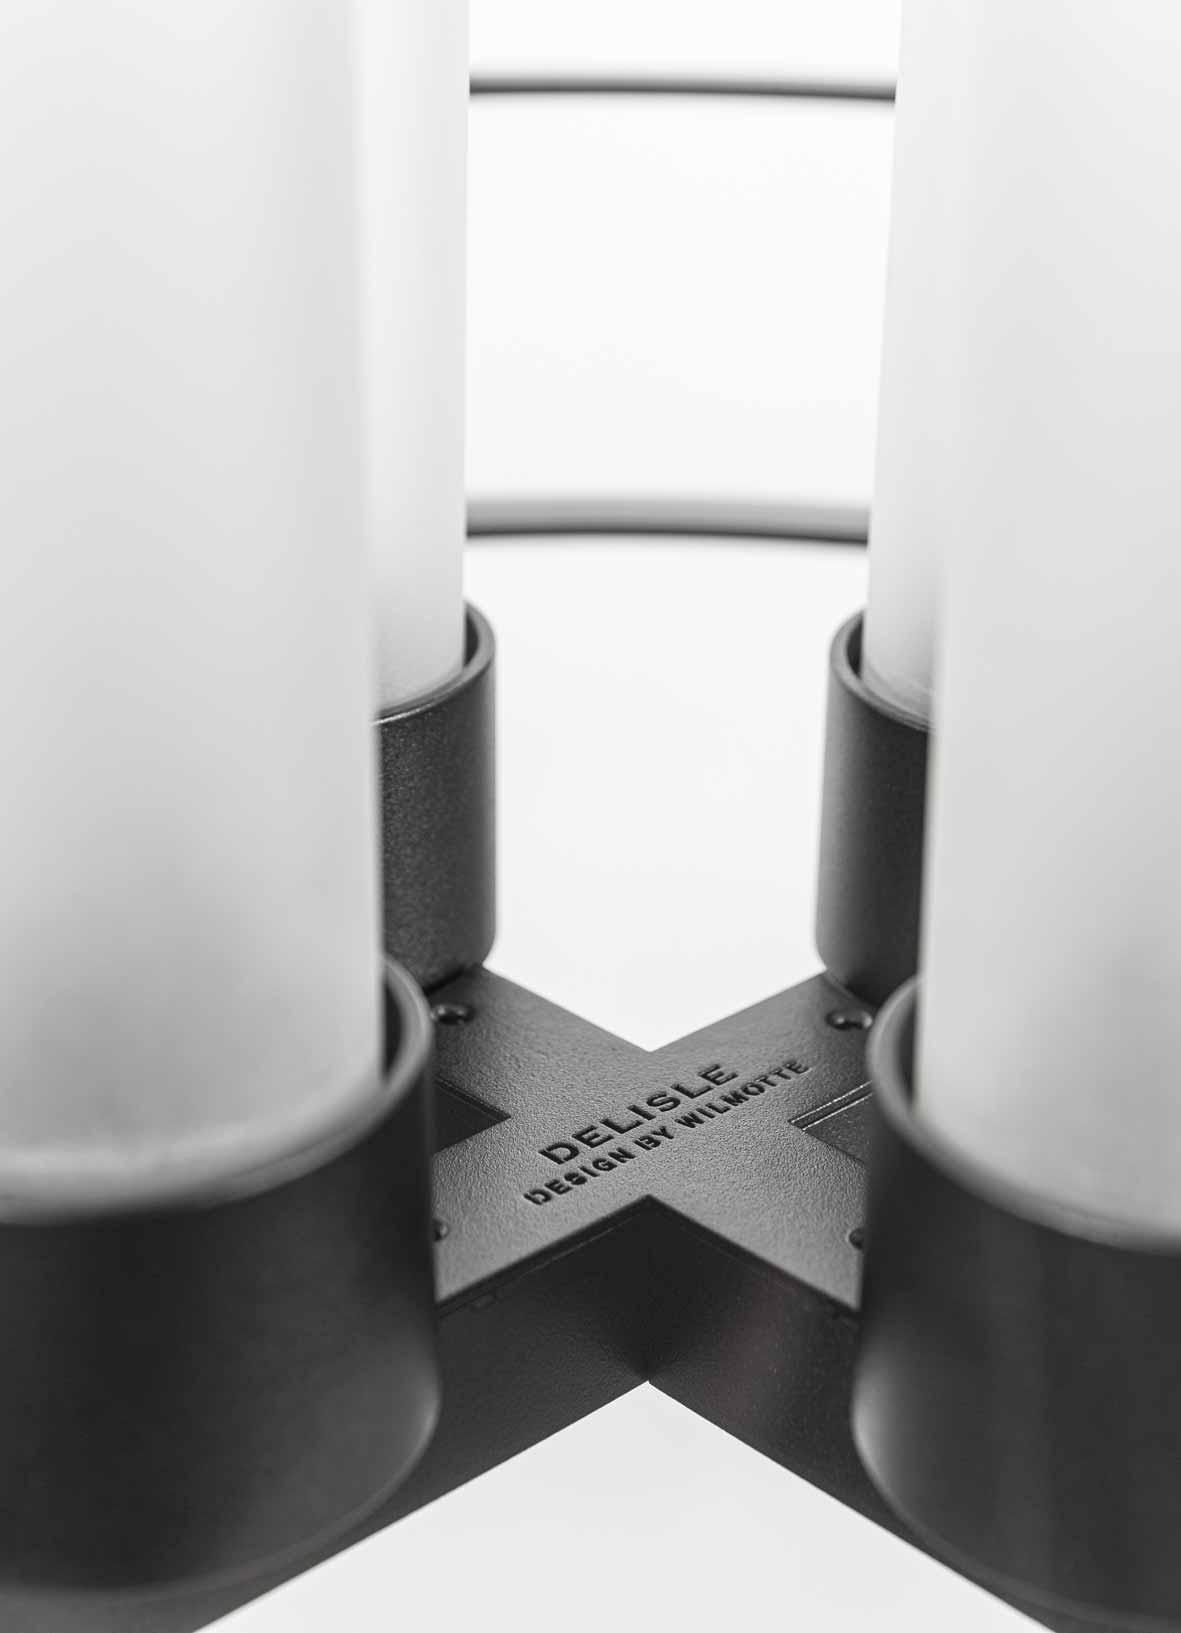 Lanternes & demi-lanternes - 13626